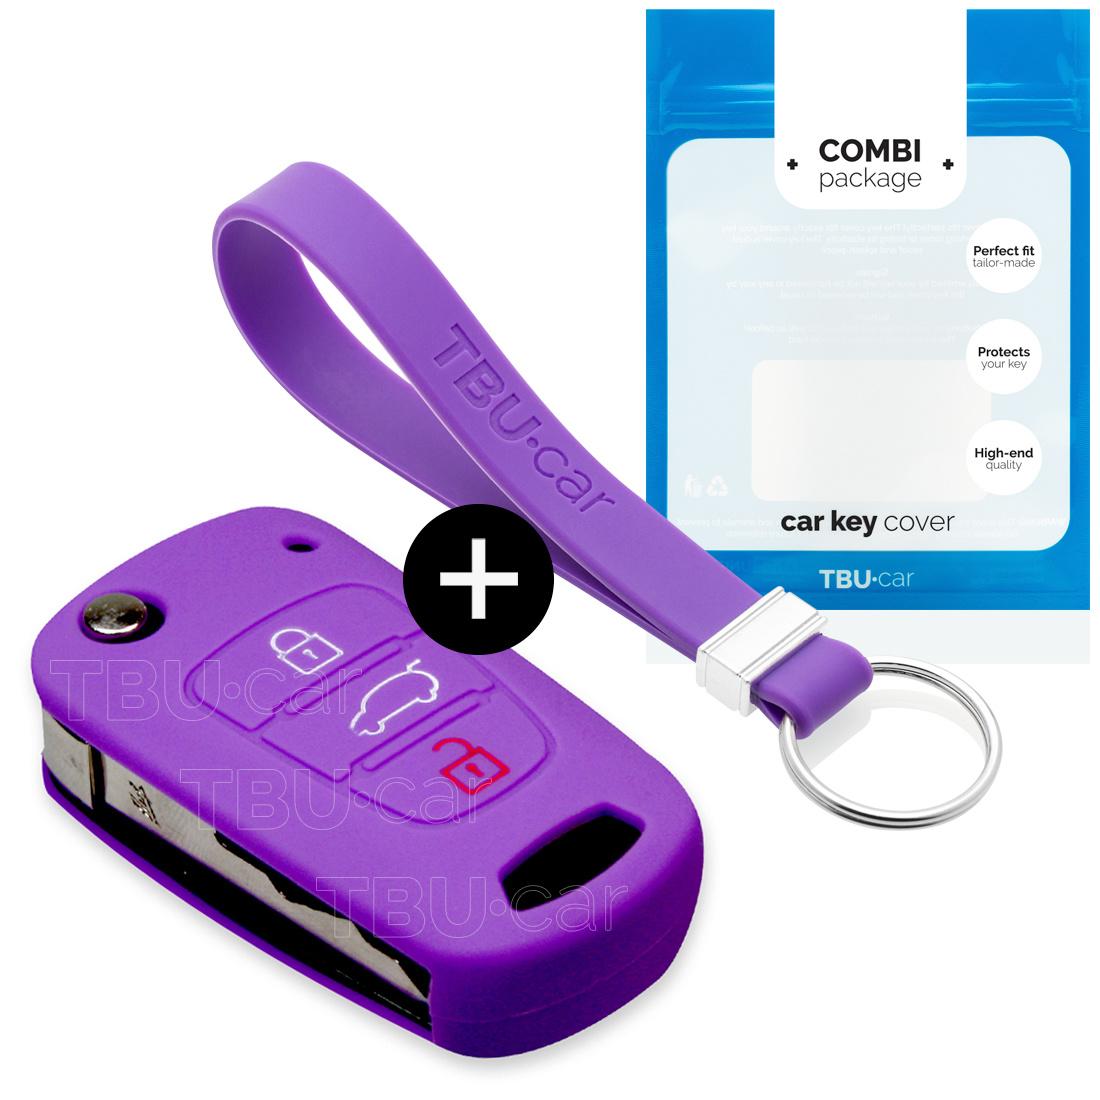 Hyundai Autoschlüssel Hülle - Silikon Schutzhülle - Schlüsselhülle Cover - Violett